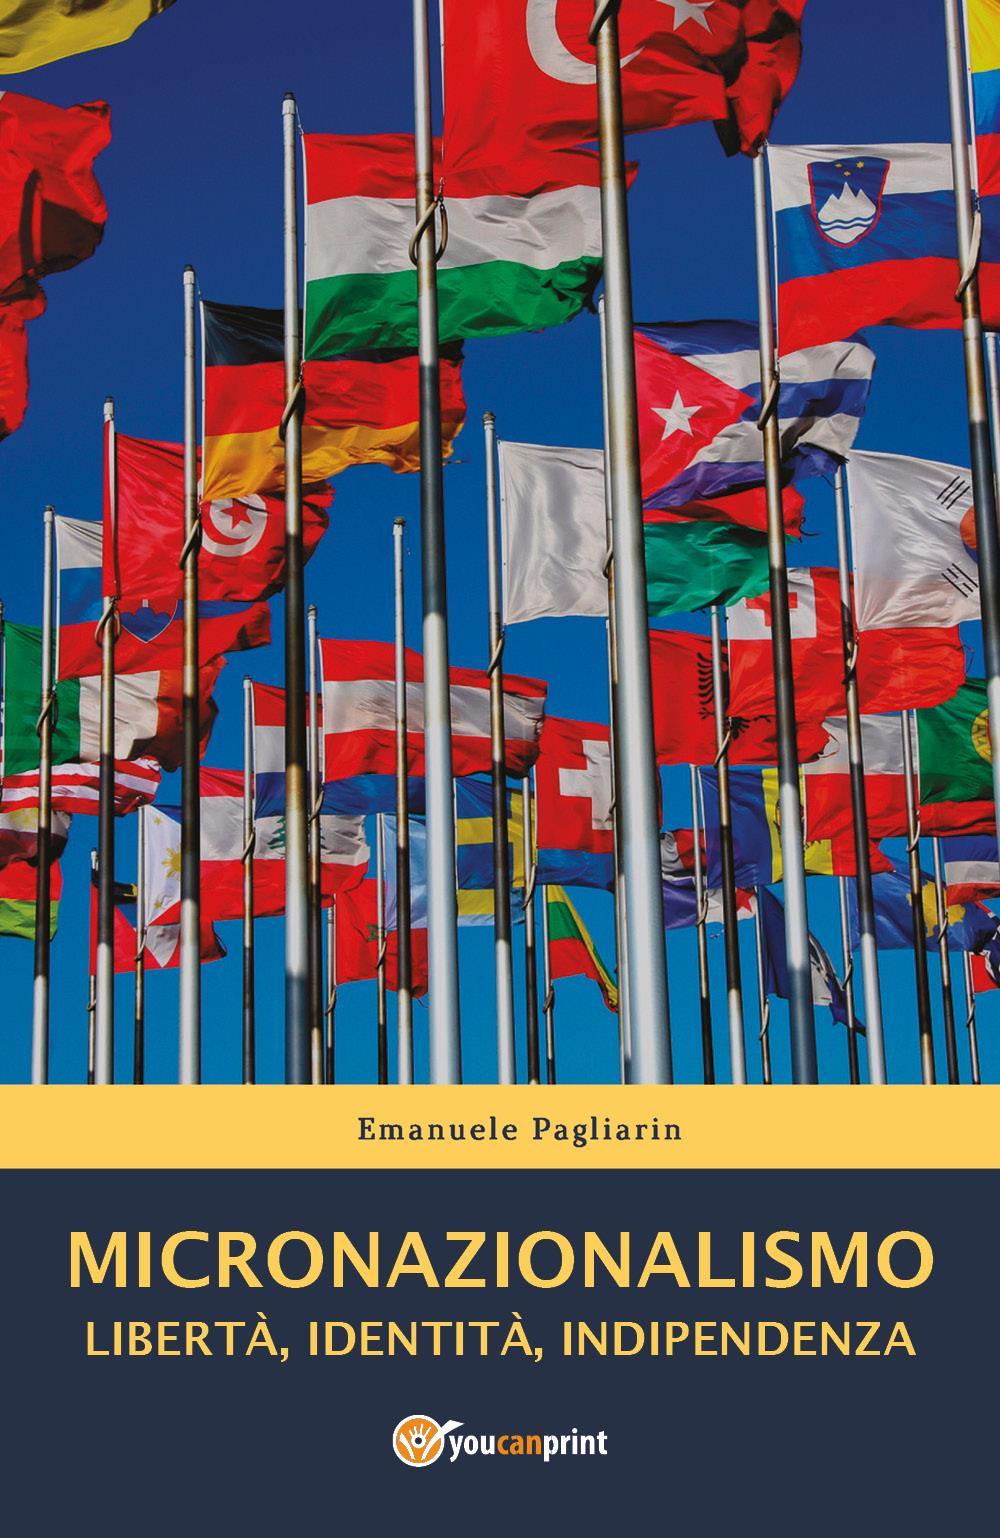 Micronazionalismo. Libertà, identità, indipendenza